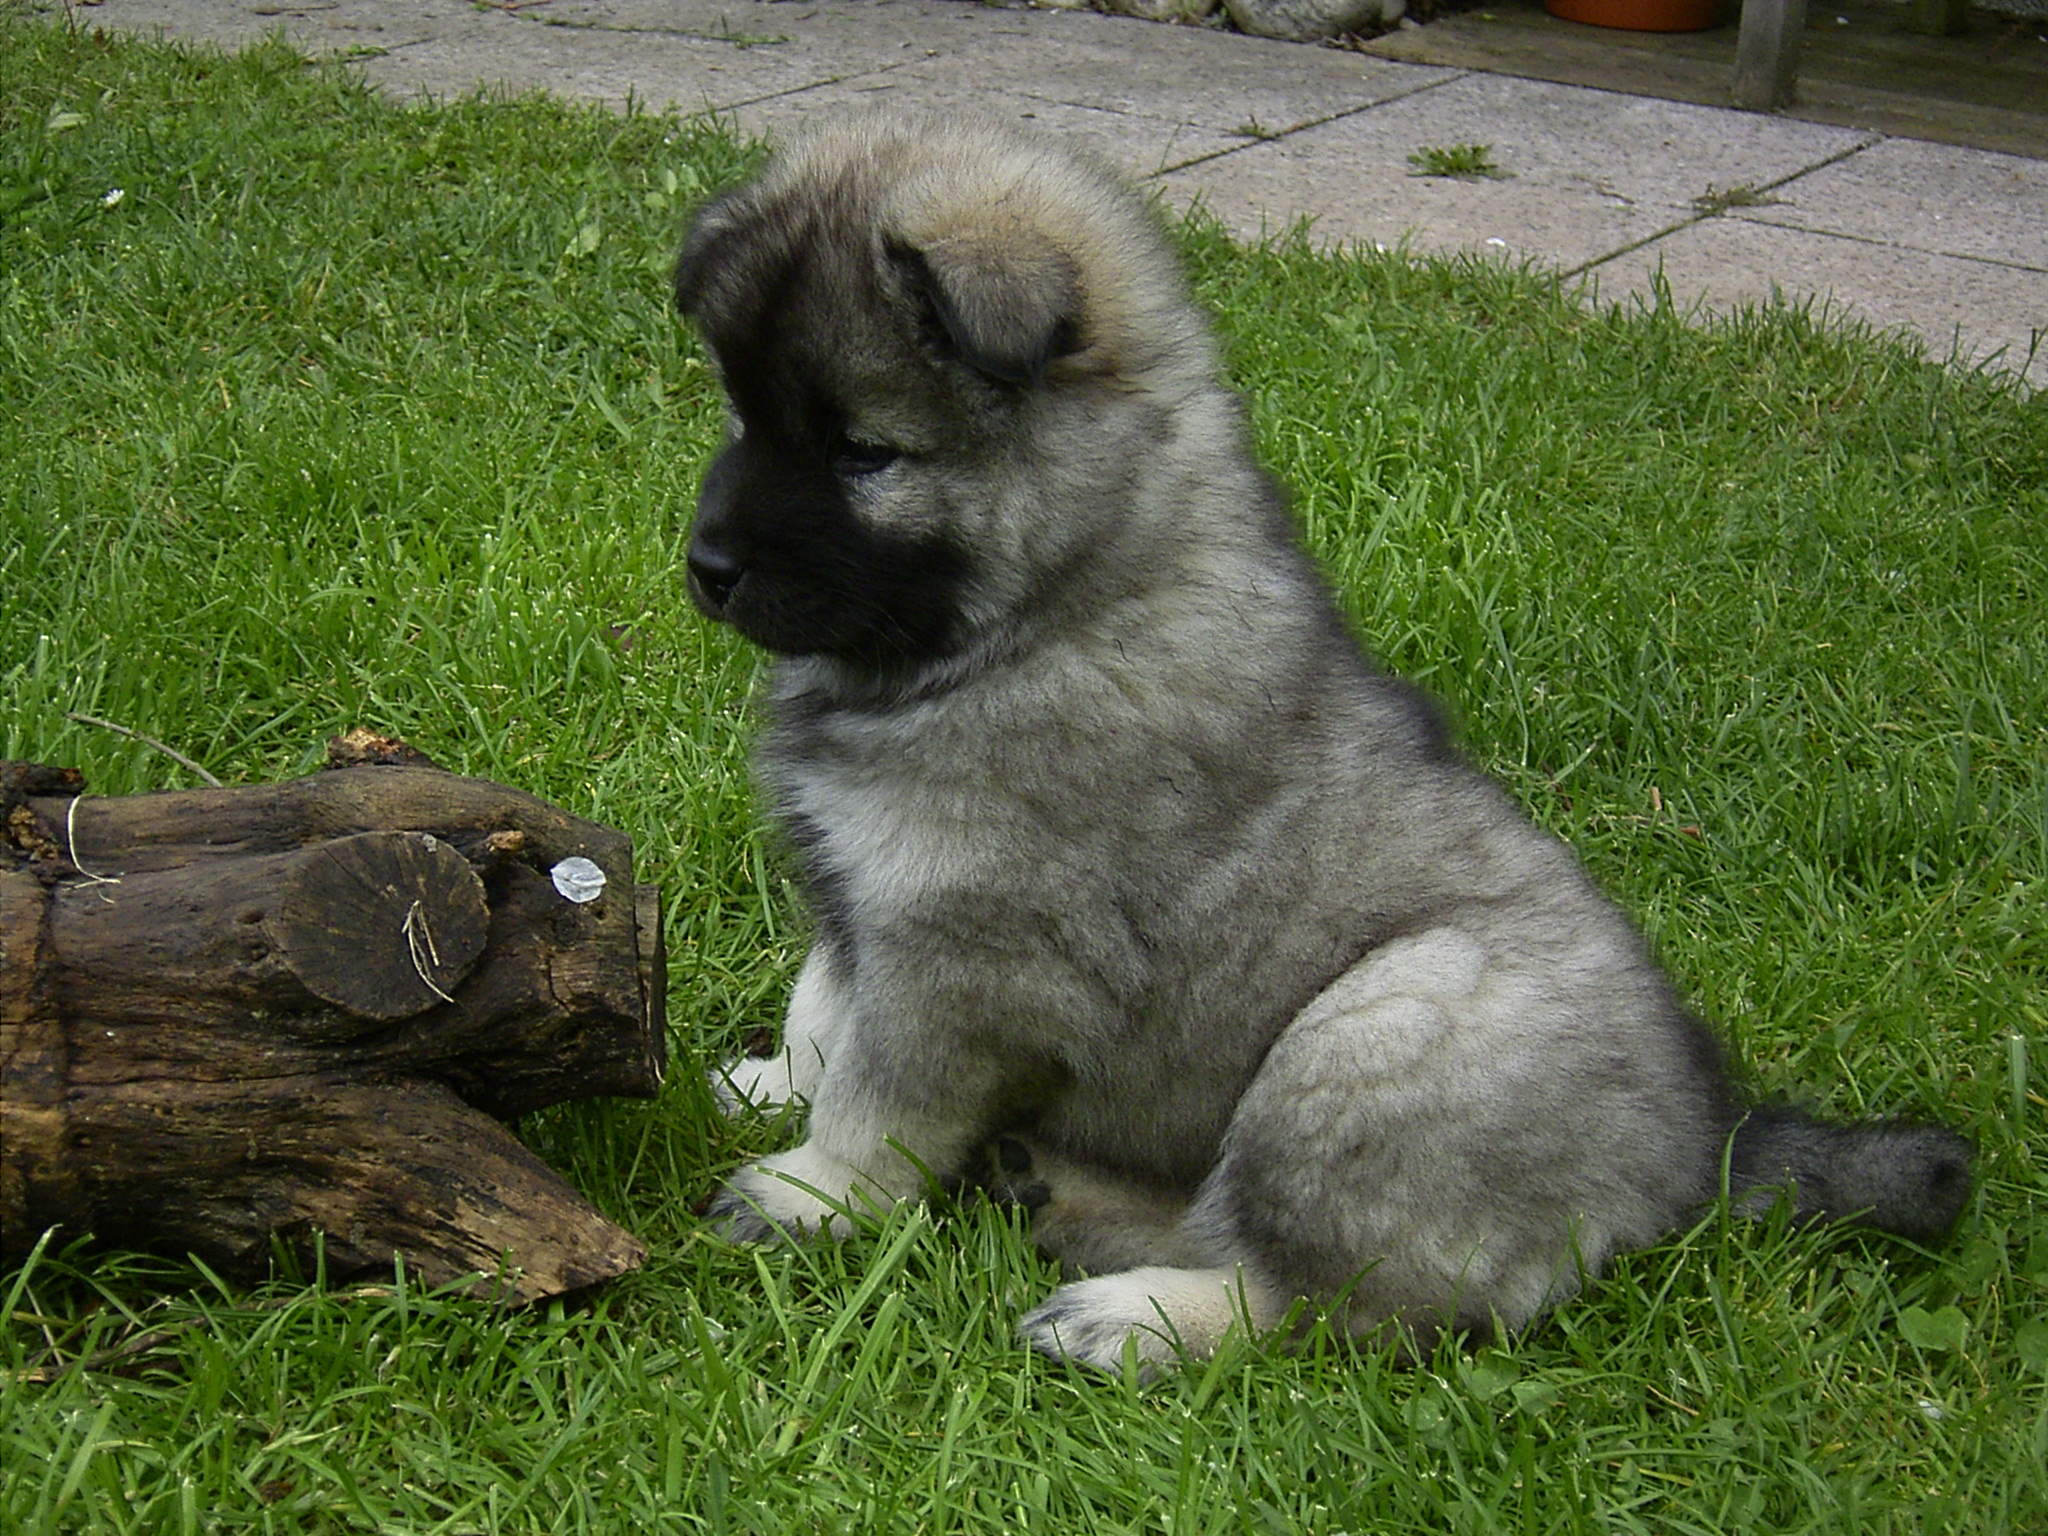 Щенок собаки евразиер на траве фото